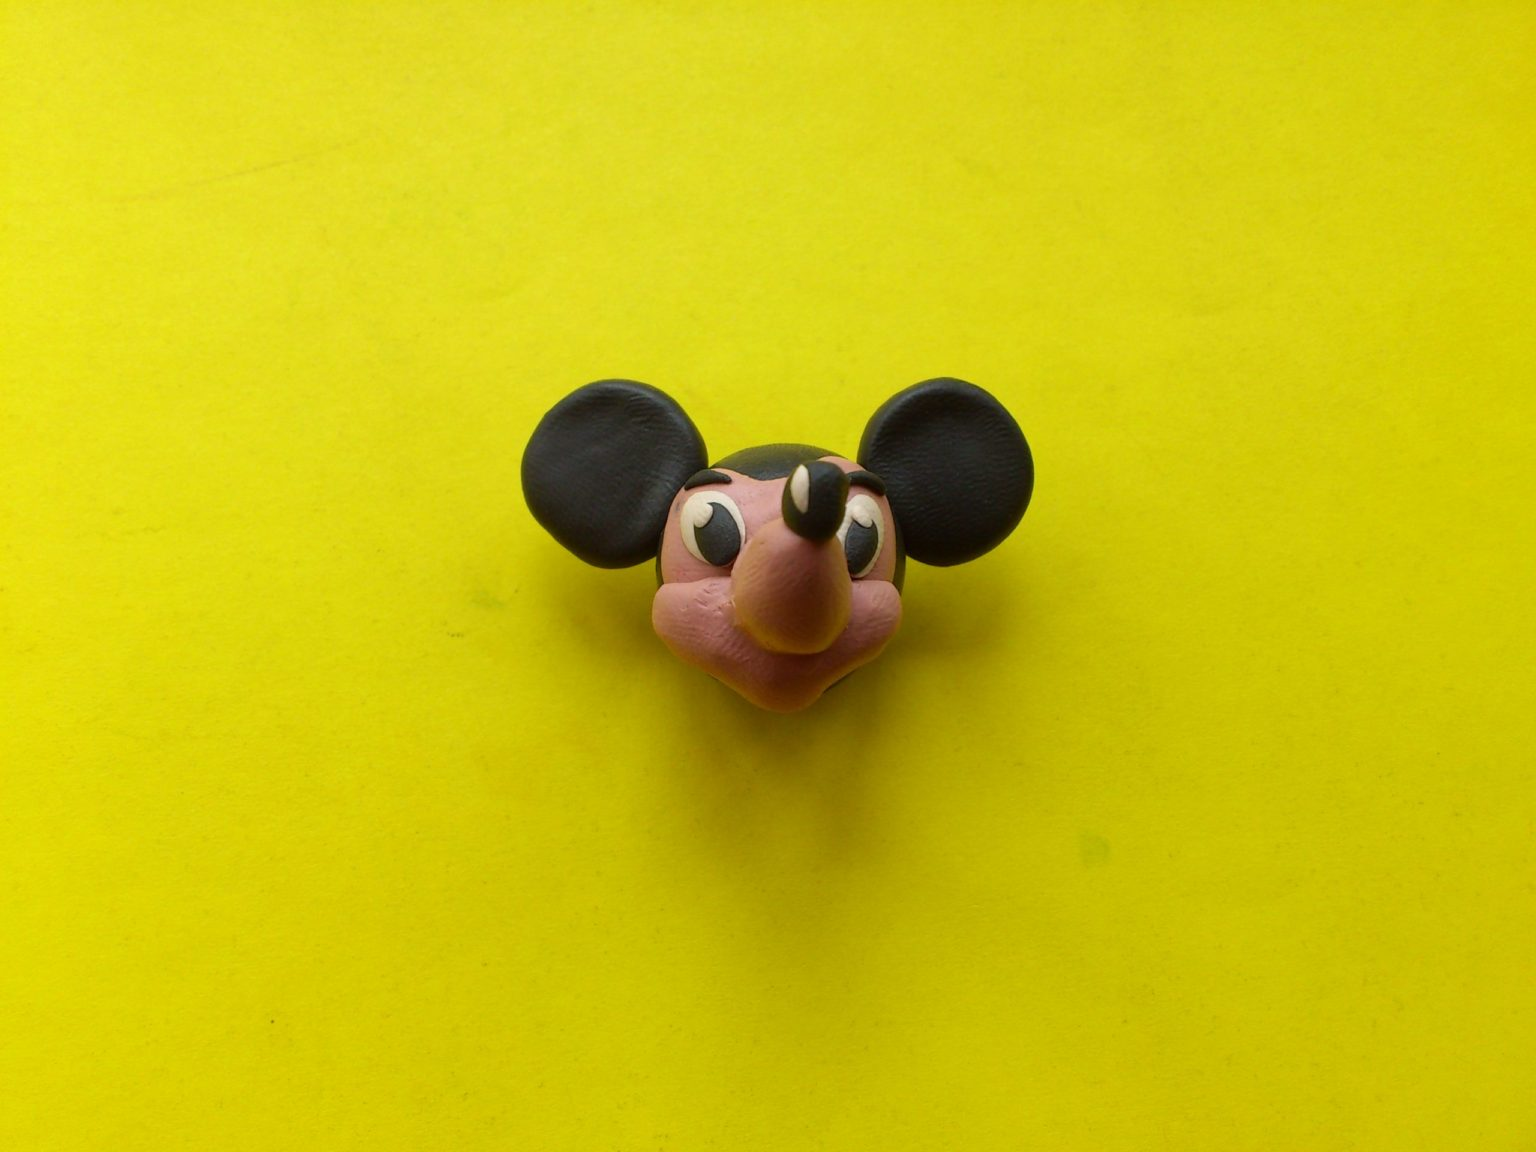 Пластилиновая голова Микки Мауса